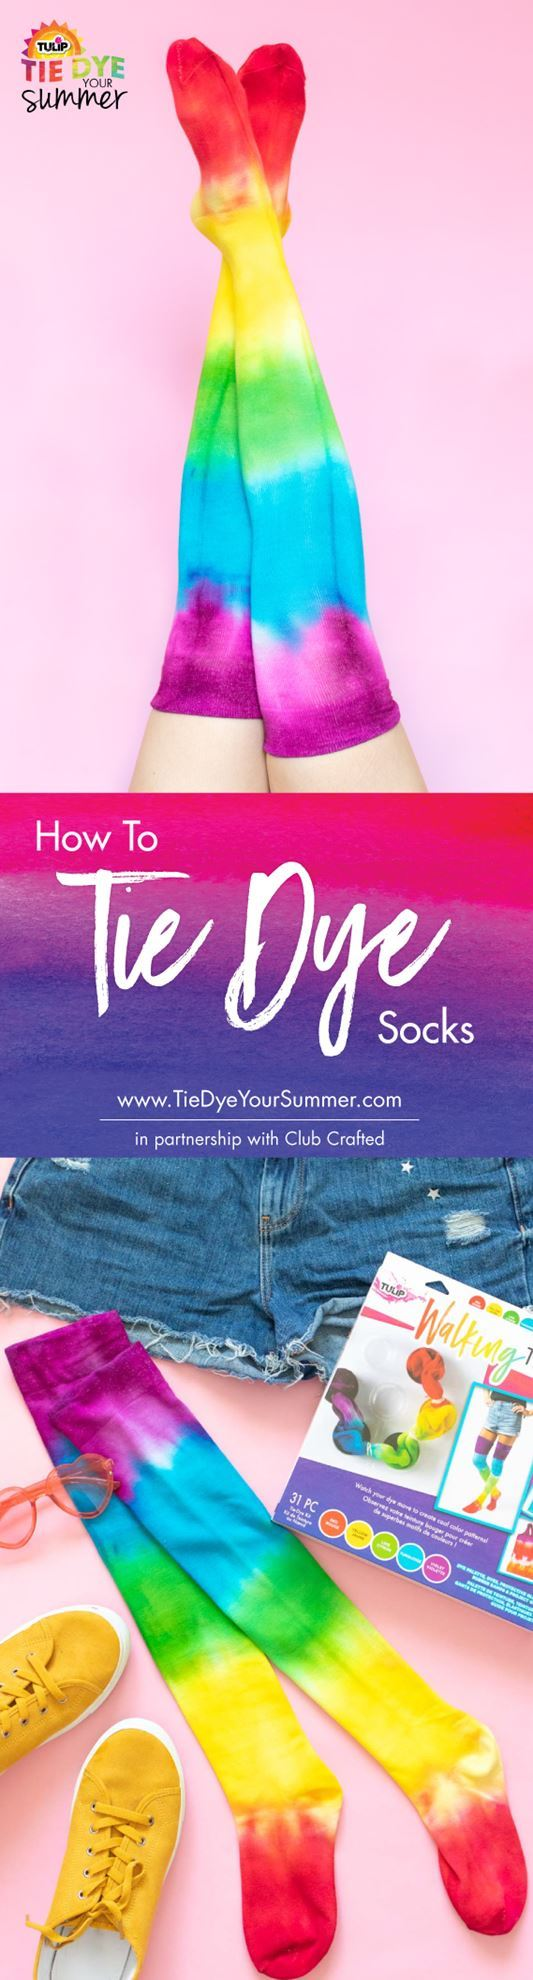 How To Tie Dye Socks The Easy Way